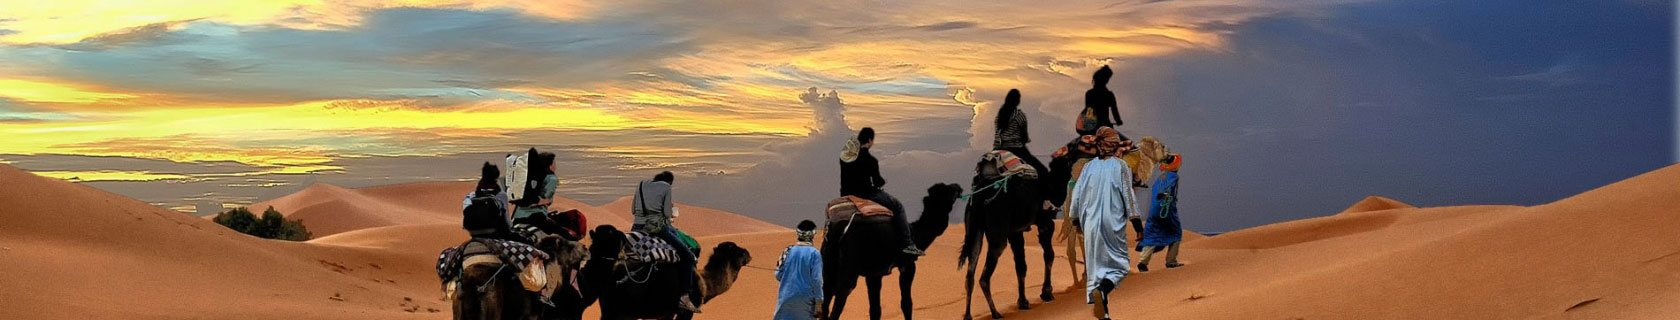 Trip-sahara-morocco